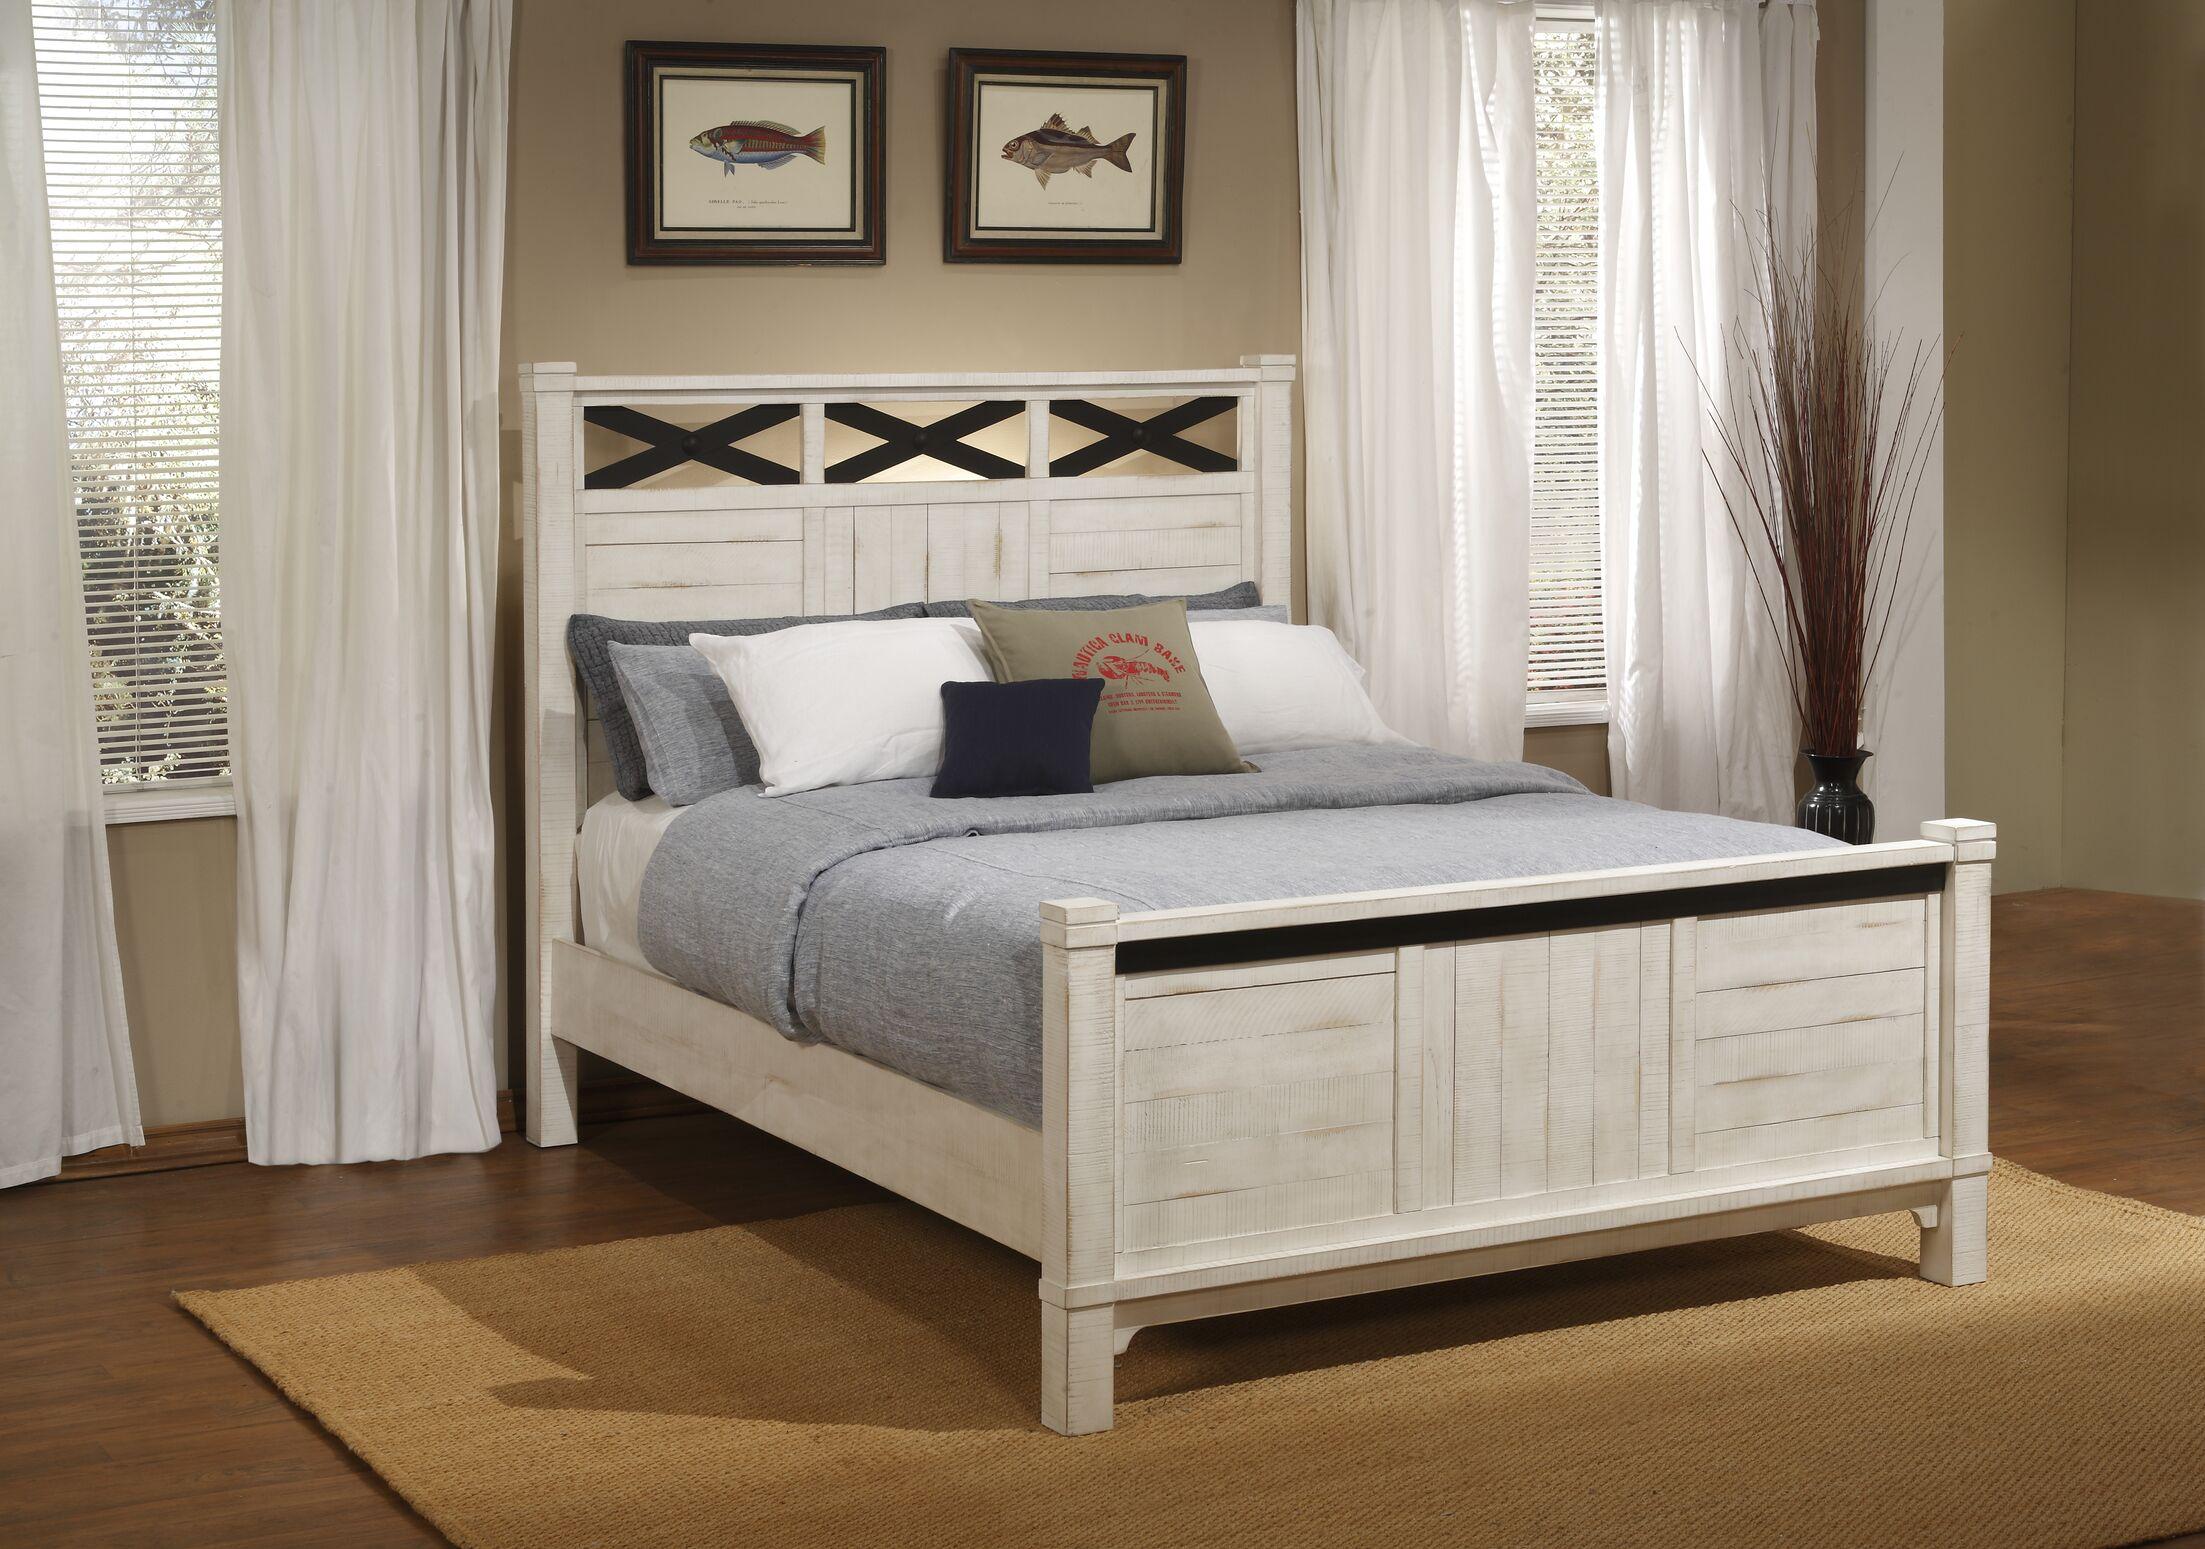 Saige Home Farmhouse Panel Bed